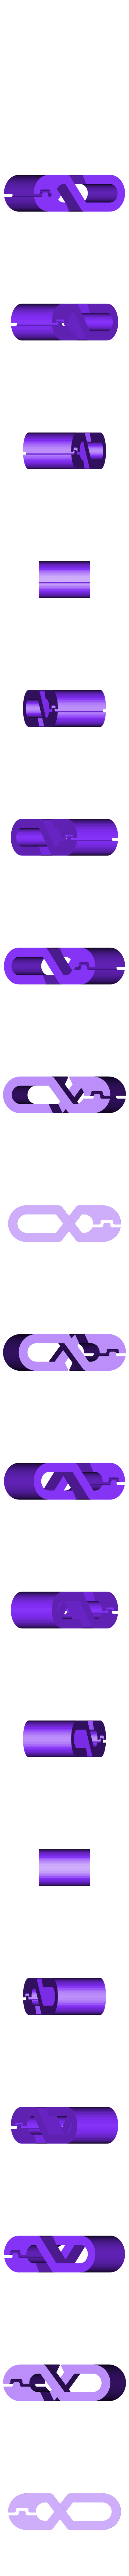 Earphone_Cable_Clip.stl Download free STL file Earphone Cable Clip • 3D print design, Muzz64